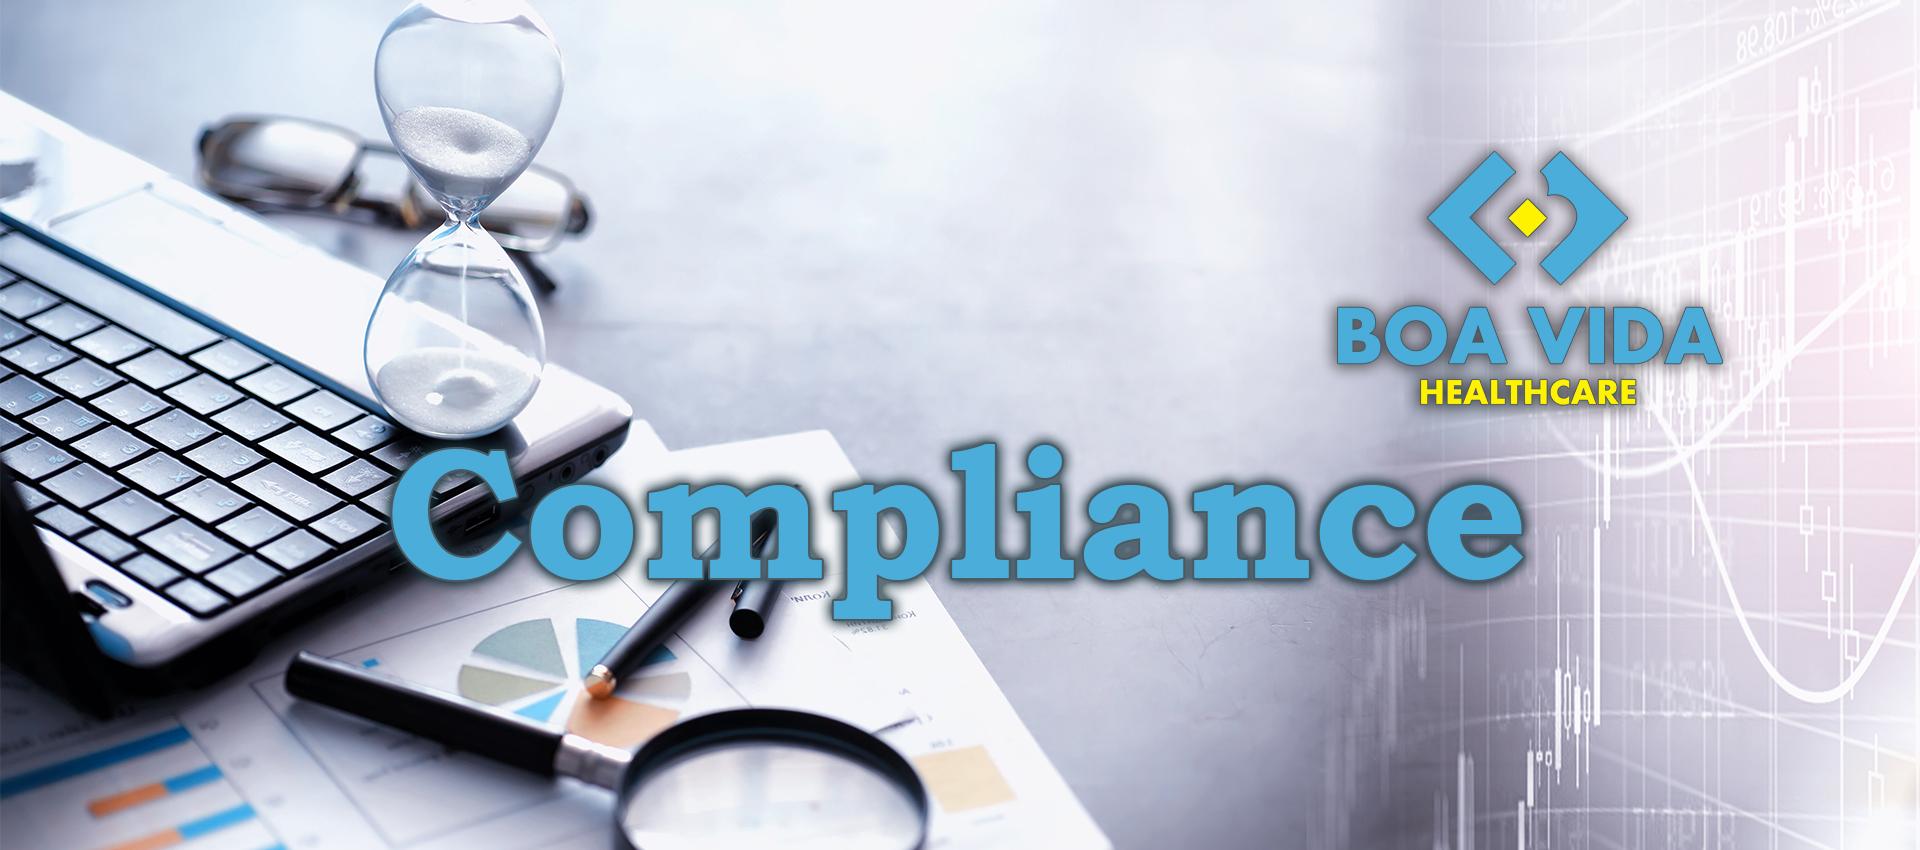 Boa Vida ComplianceBoa Vida ComplianceBoa Vida Compliance